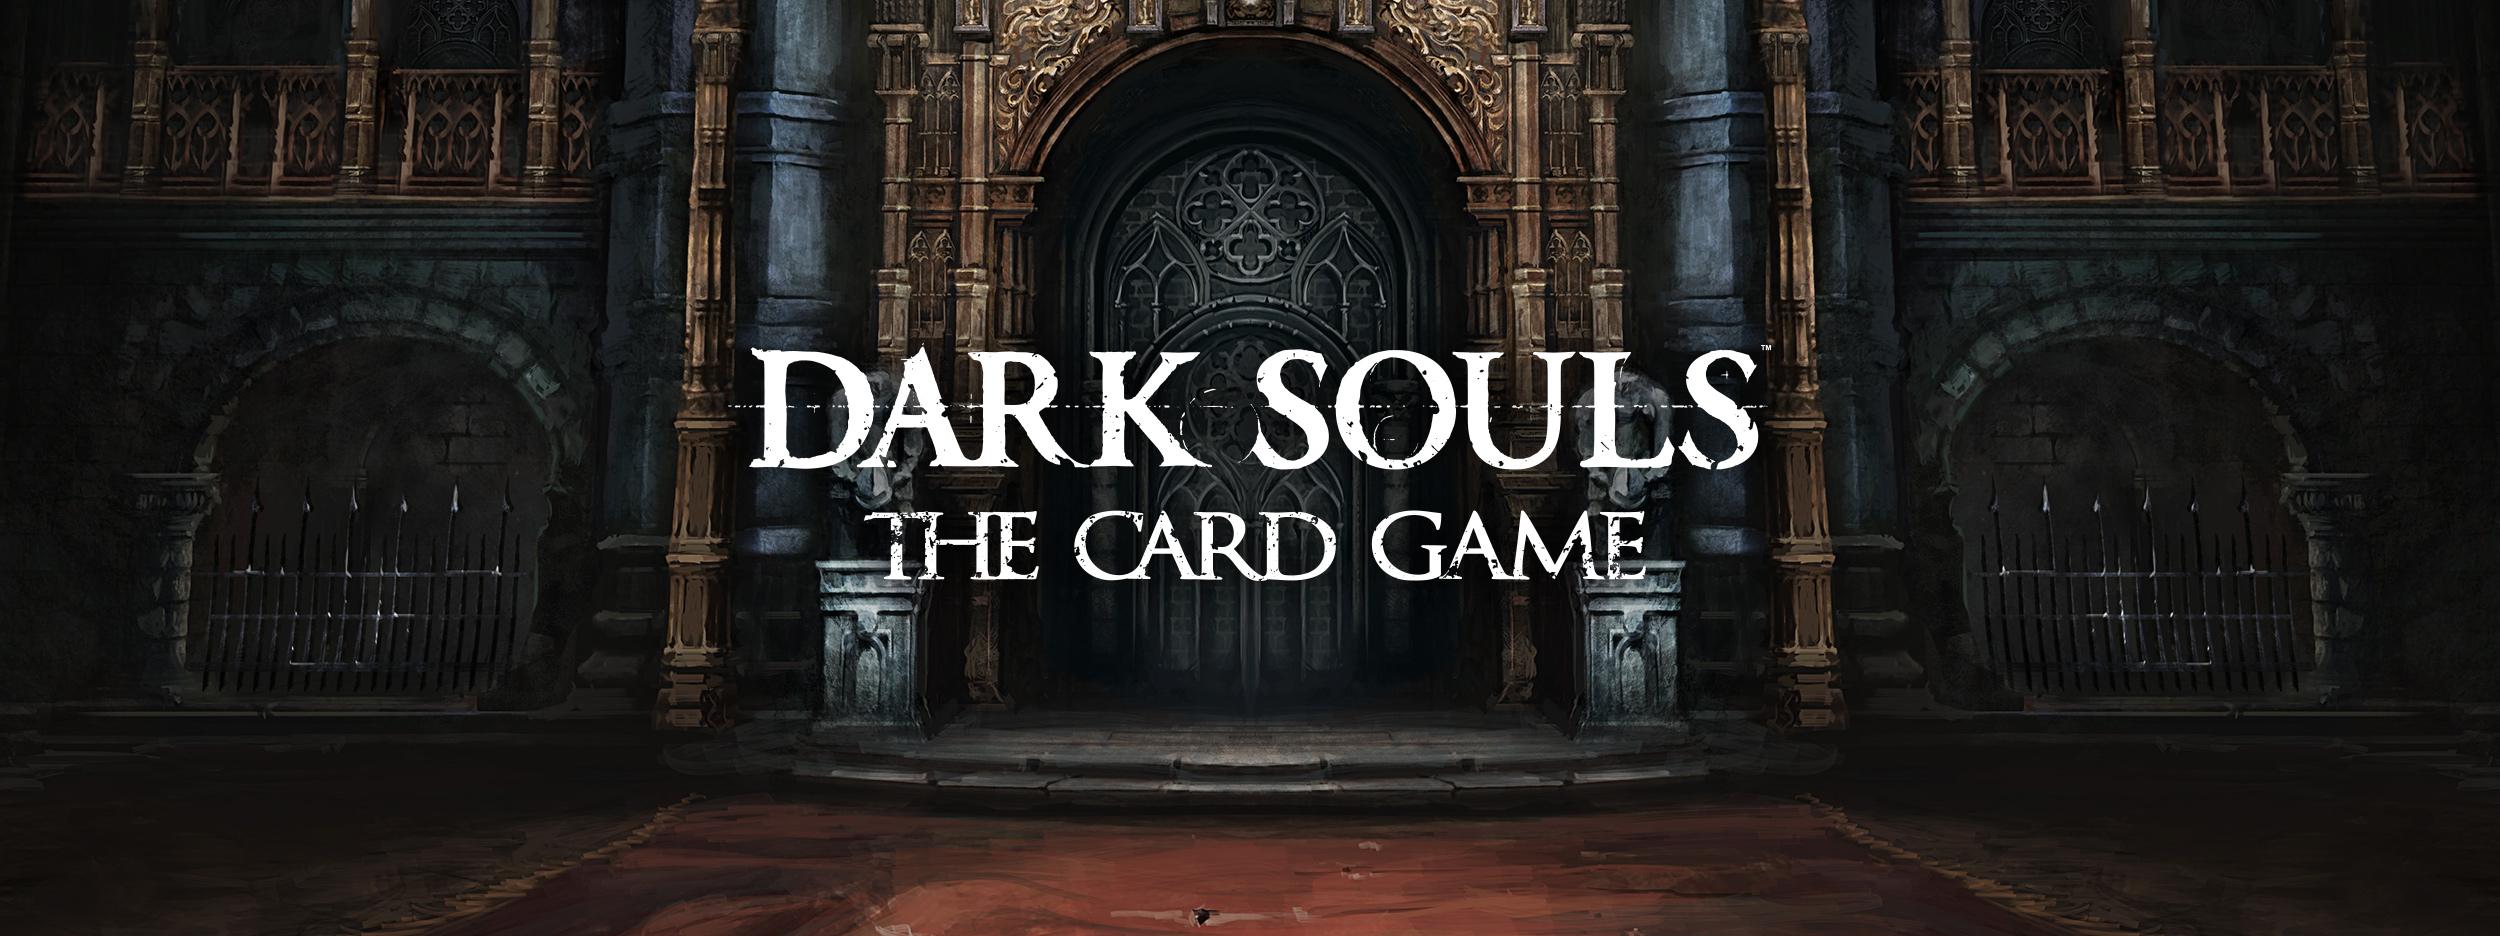 Header-DS-Card-Game-3.jpg